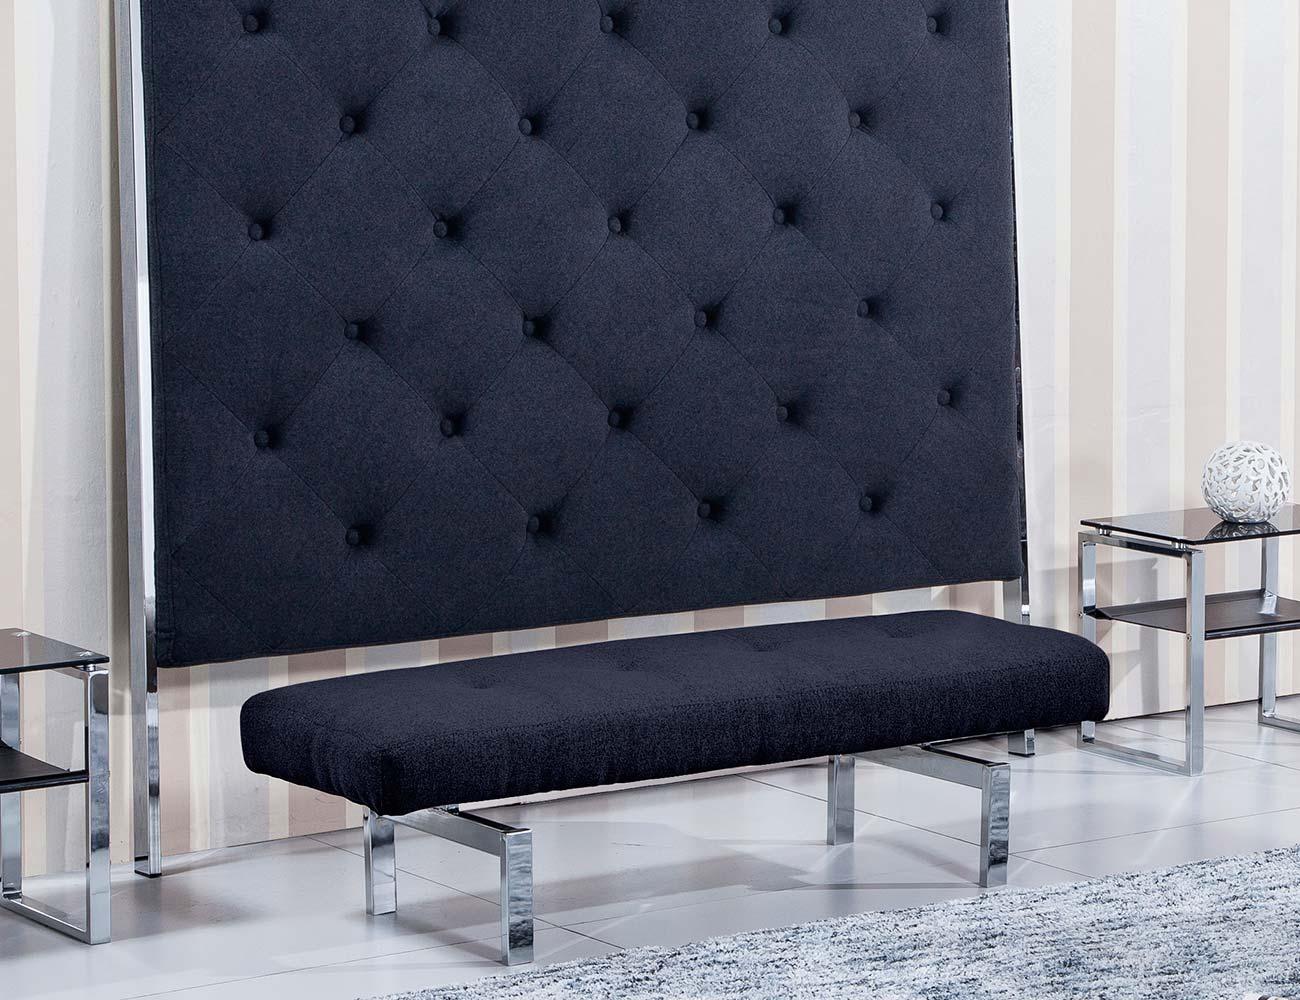 Banco banqueta tapizado gris marengo1